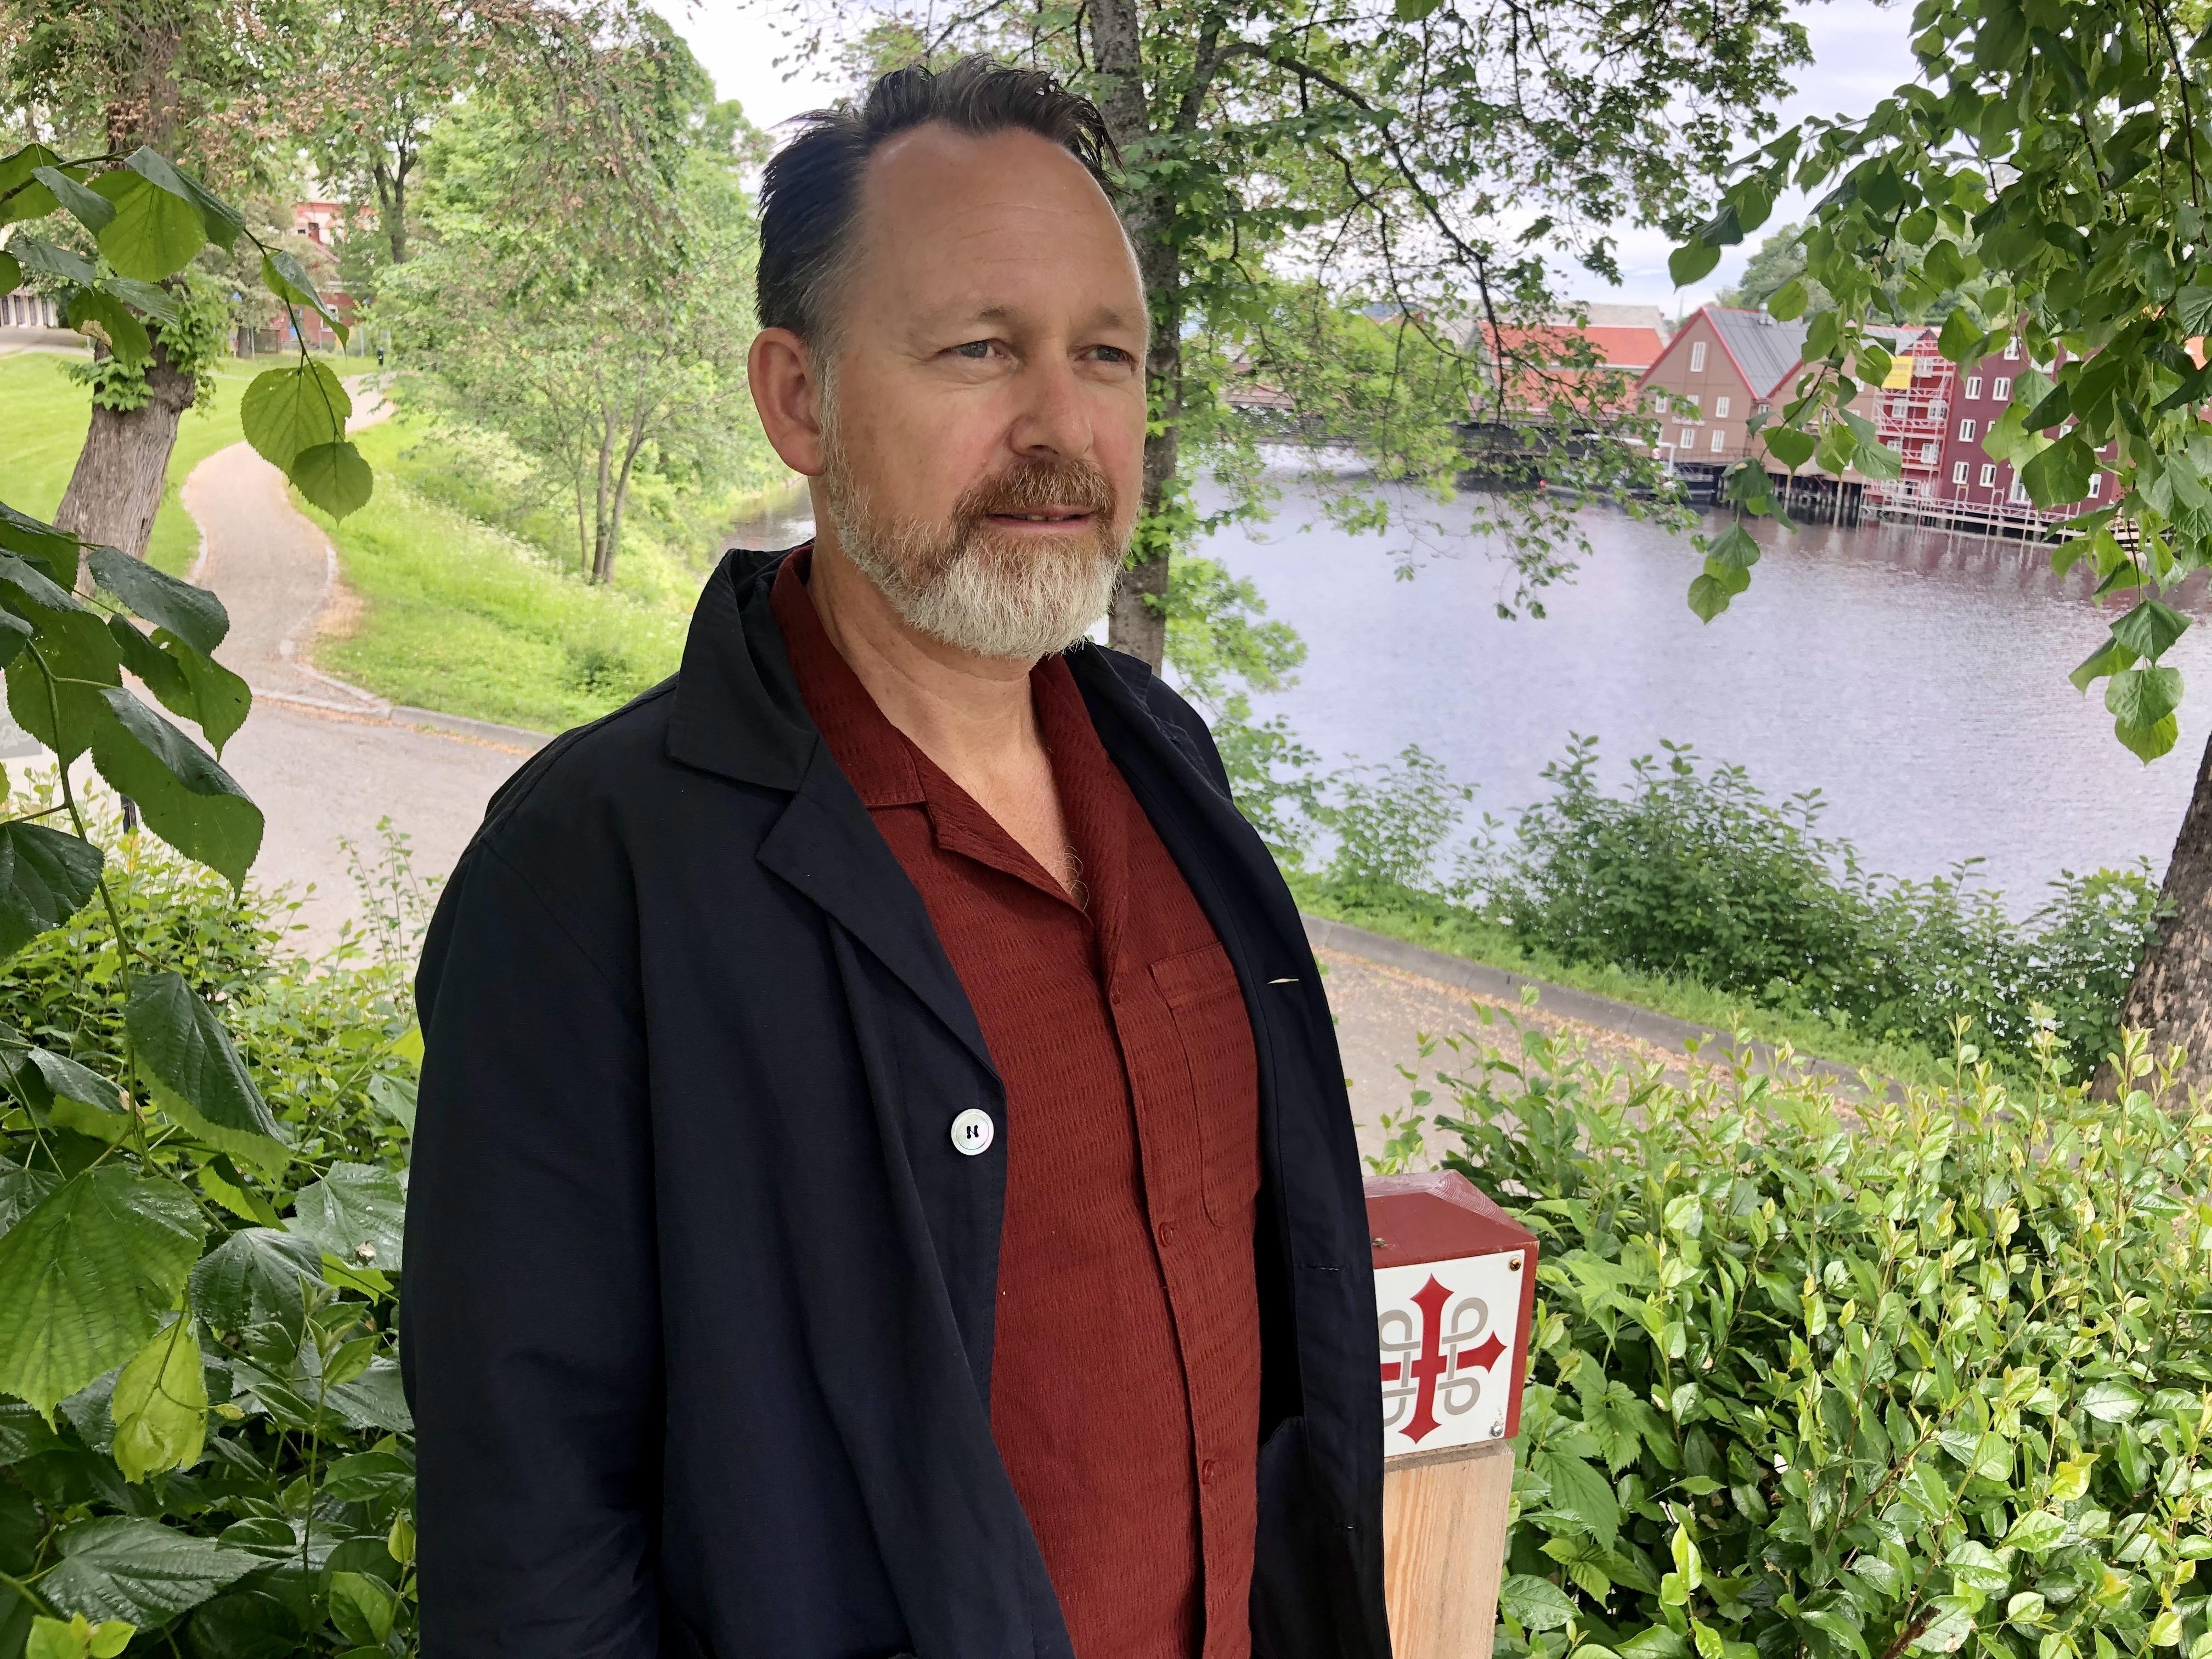 Einar Vegge